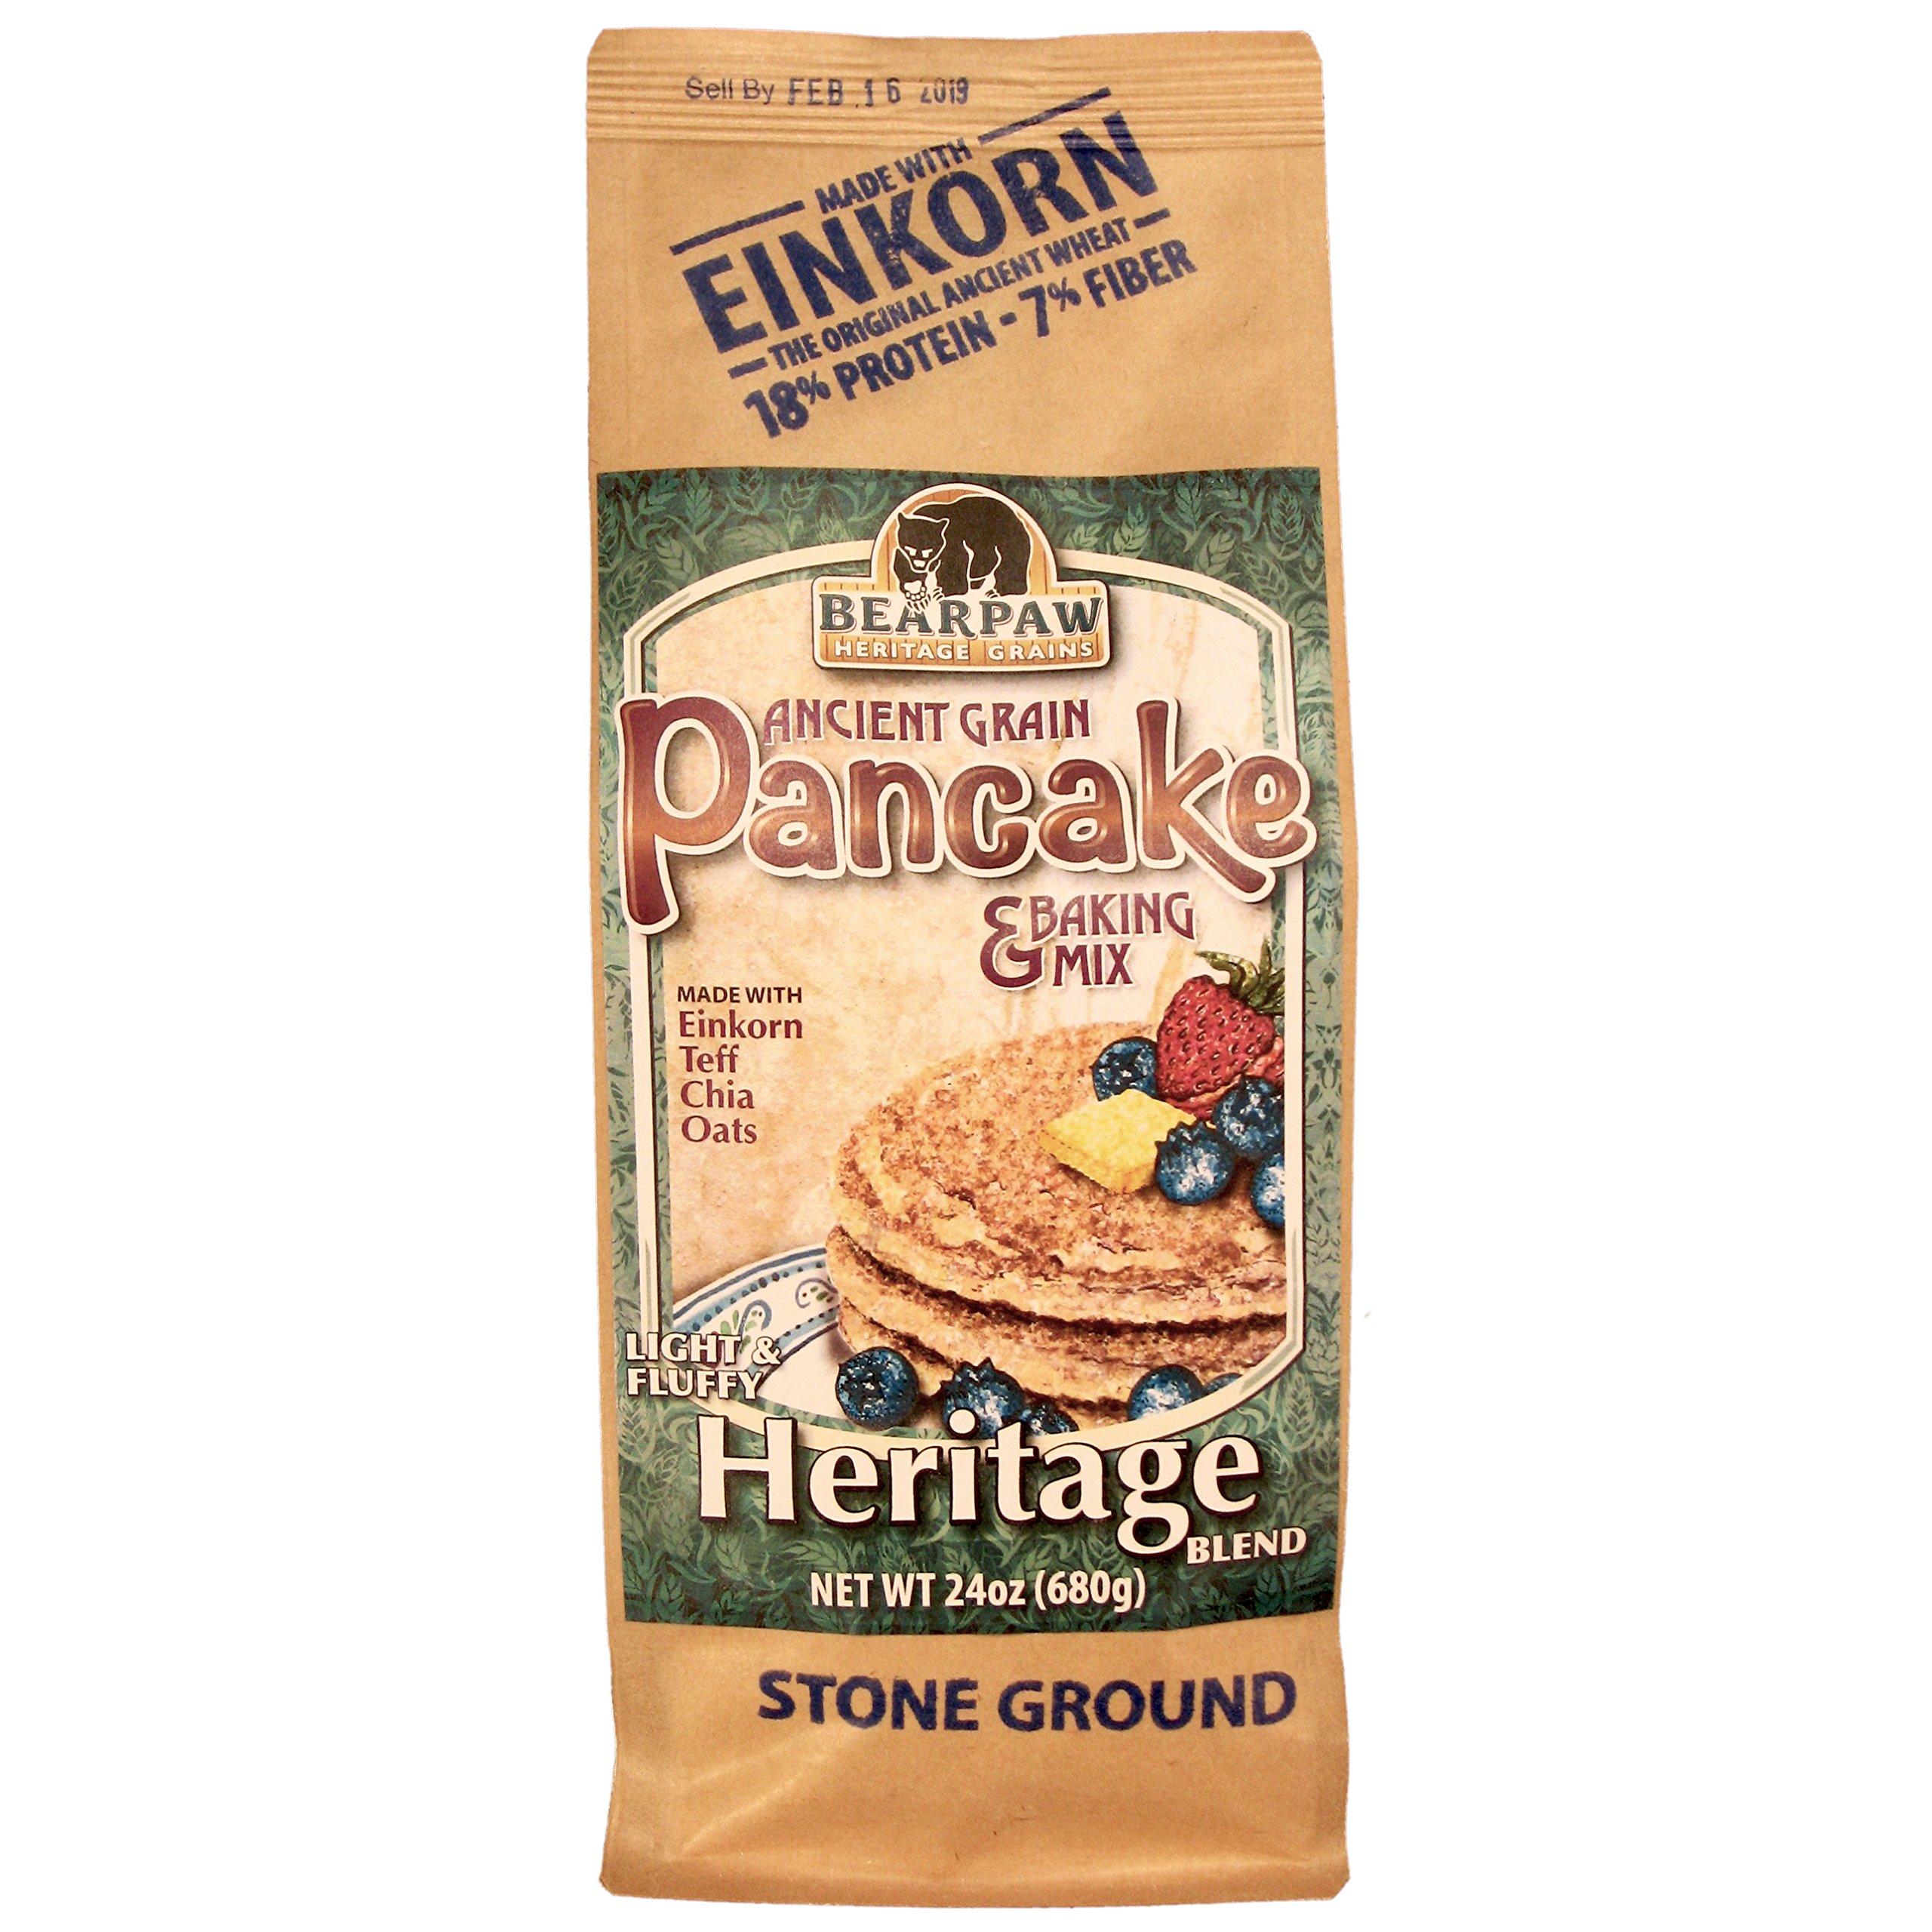 Bearpaw Ancient Grain Pancake Mix, Heritage Blend (24 ounce), Einkorn, Teff, Chia, Oats, 16% protein, BearpawGrains 861262000302